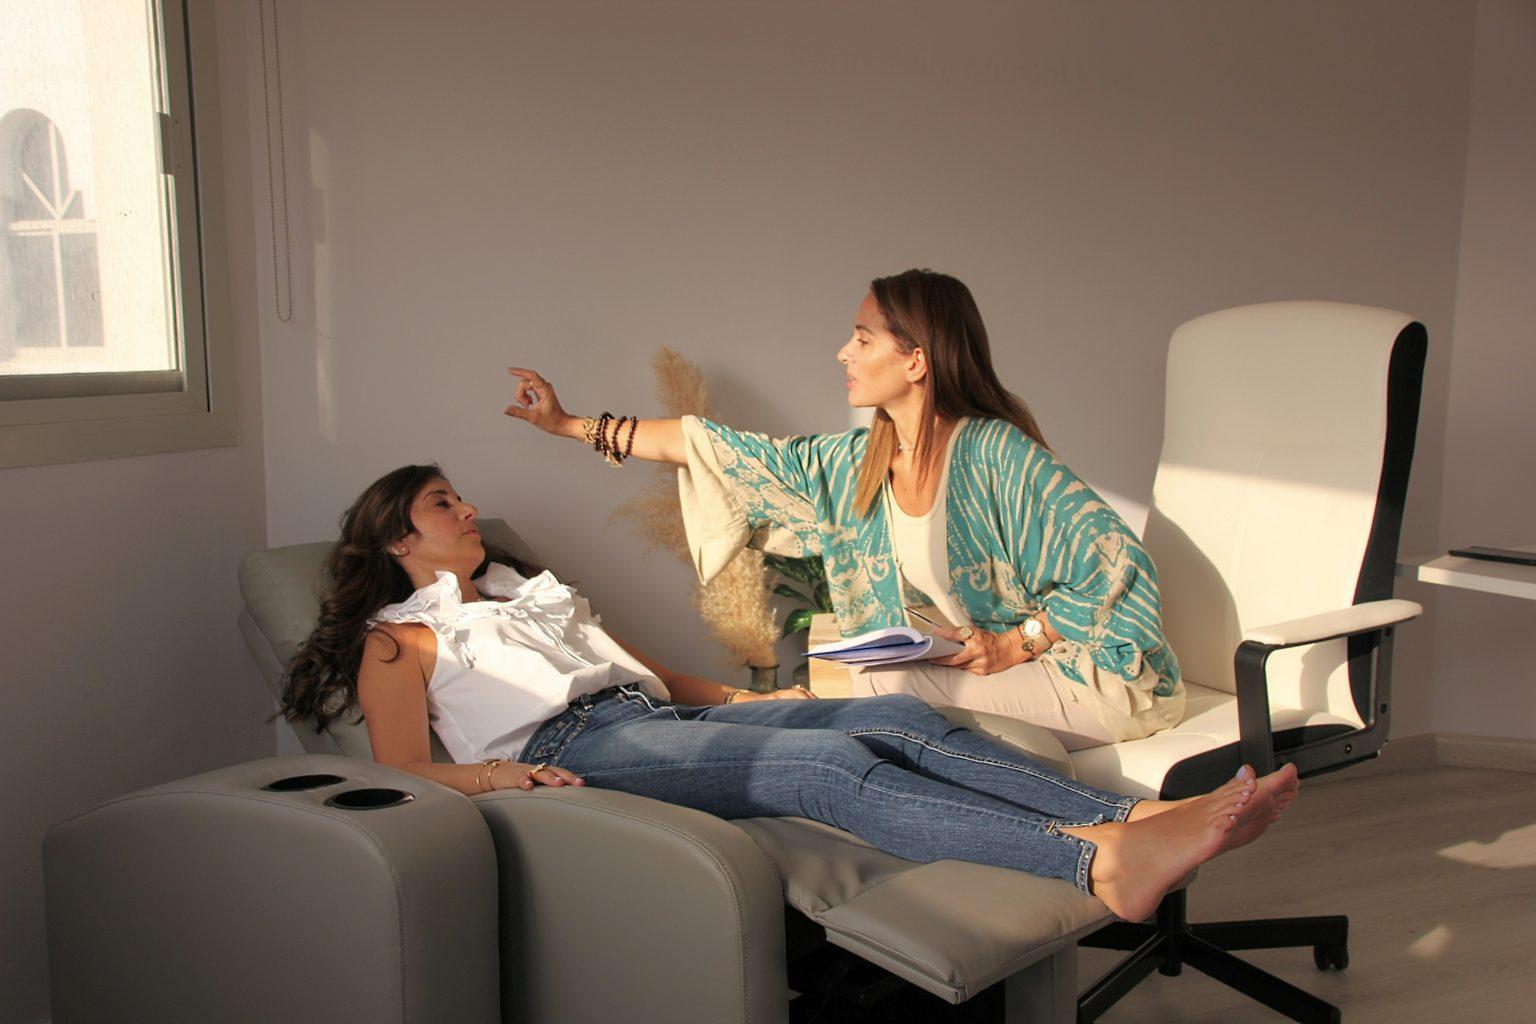 Amygdala Helps You, Home of Wellness